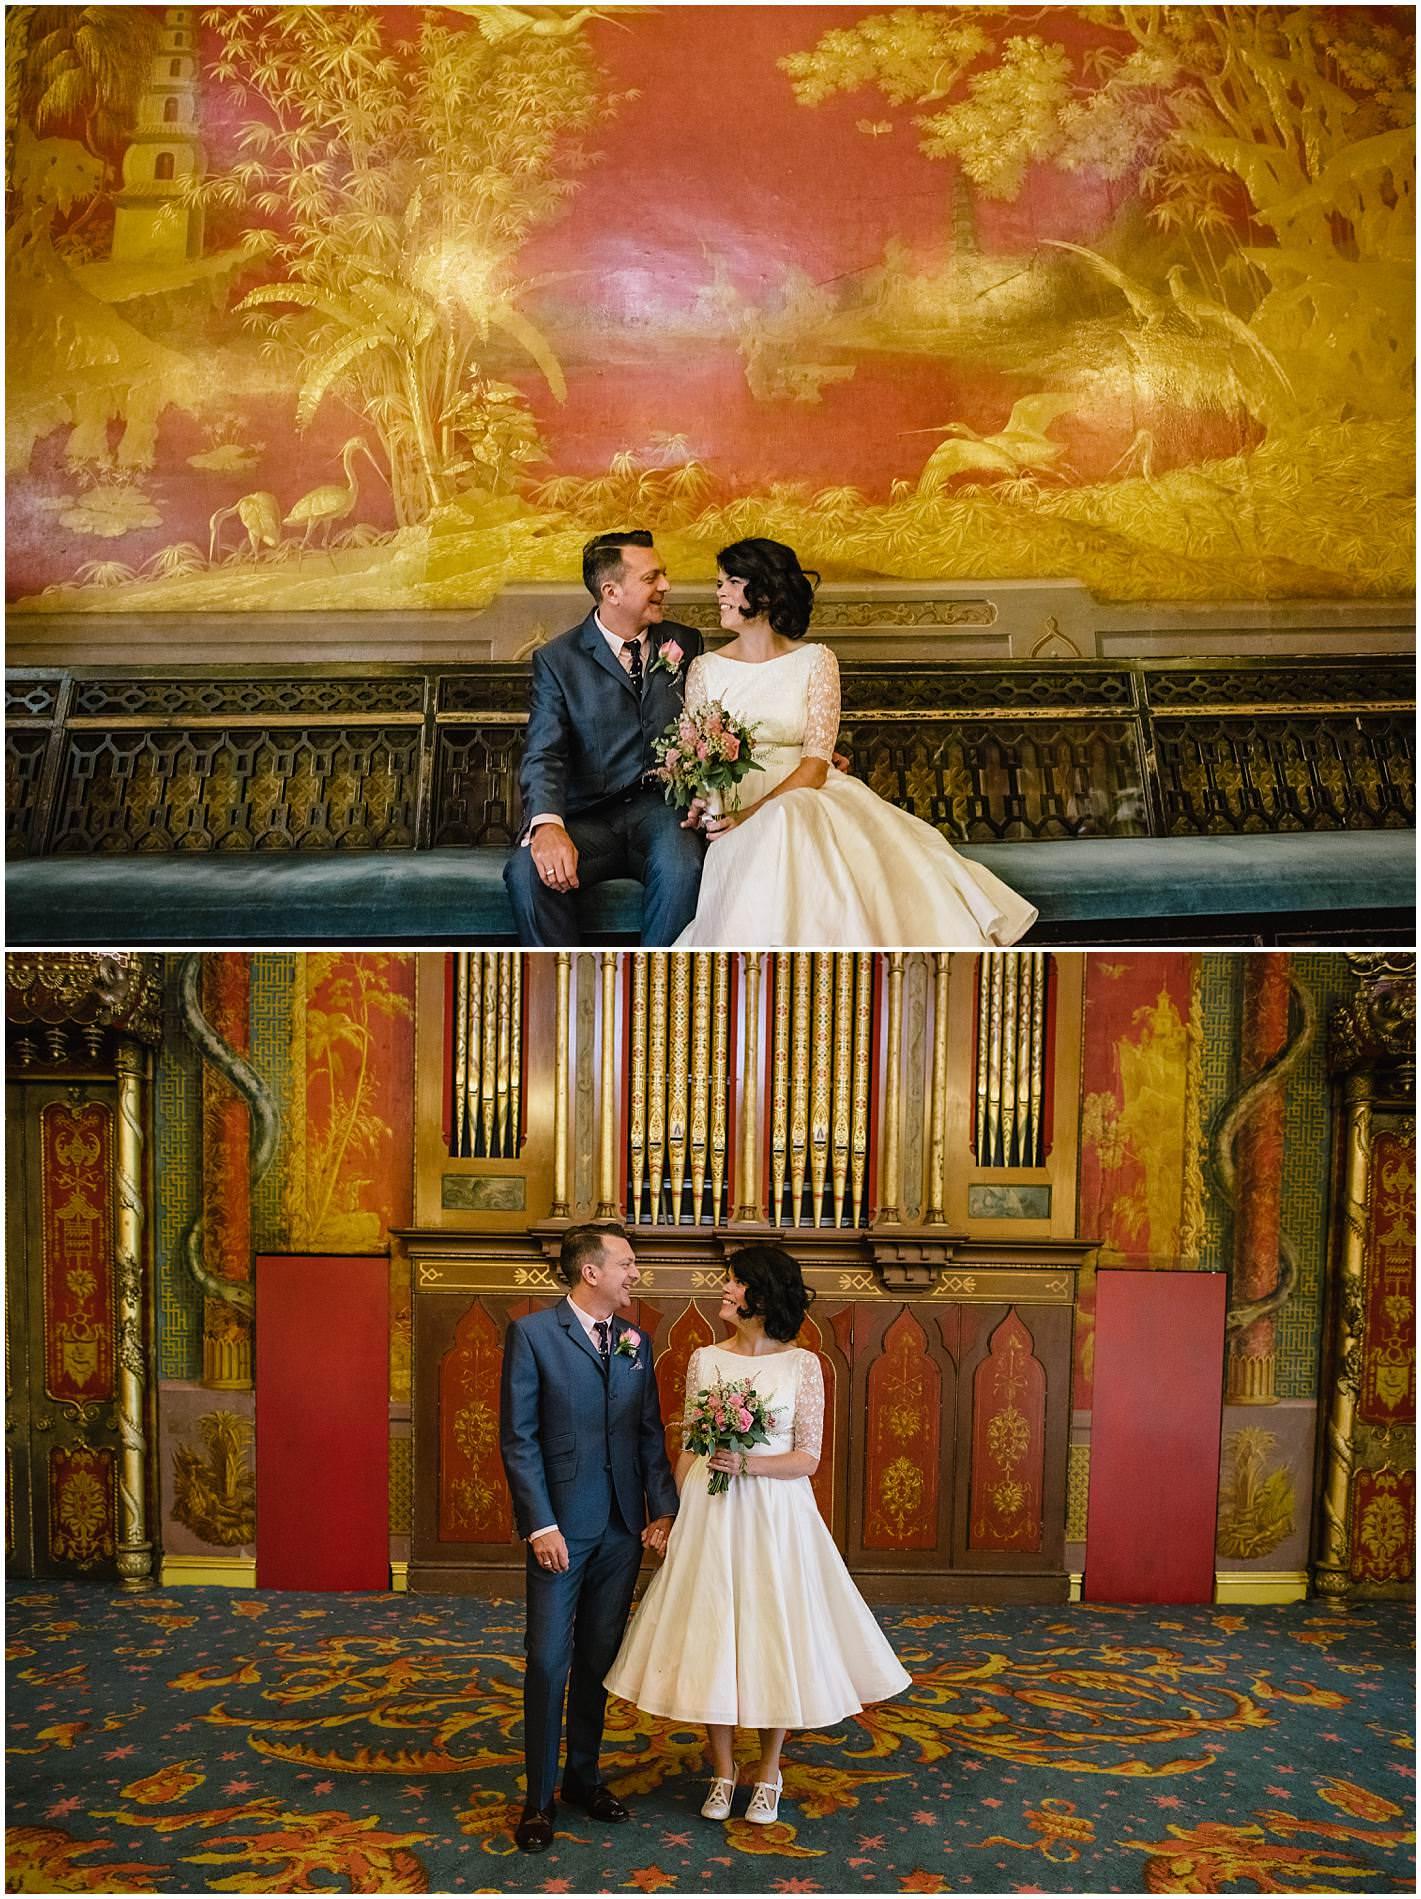 royal-pavilion-wedding-brighton385